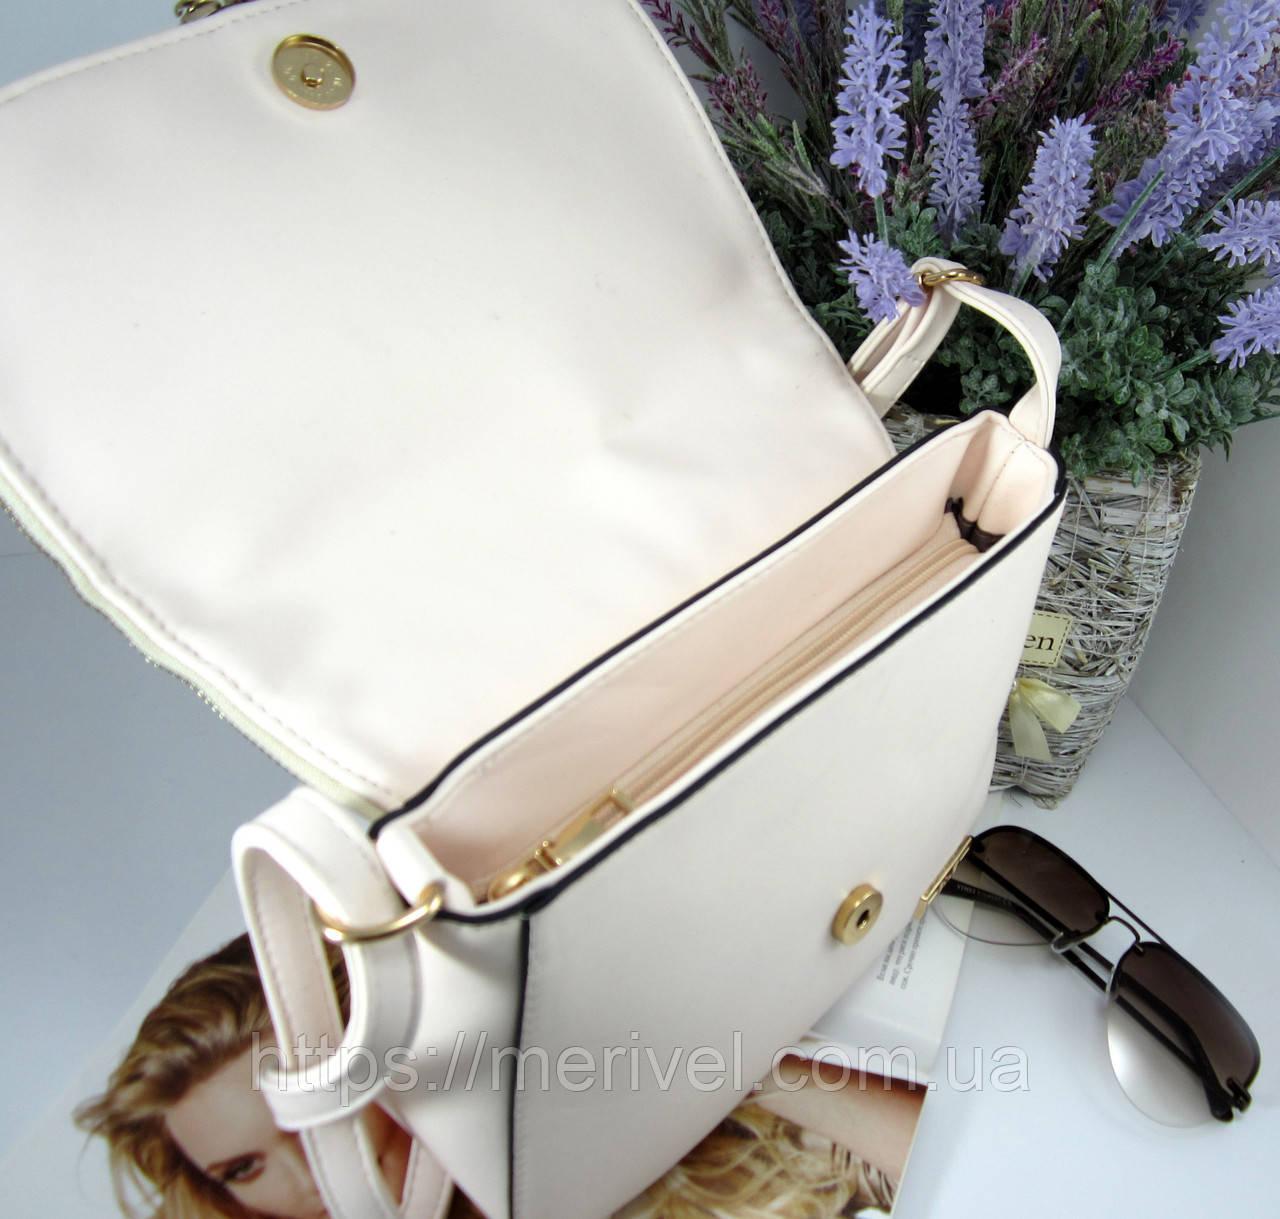 1e6bb8afd1e5 Женская сумка молочная f-708: продажа, цена в Одессе. женские ...